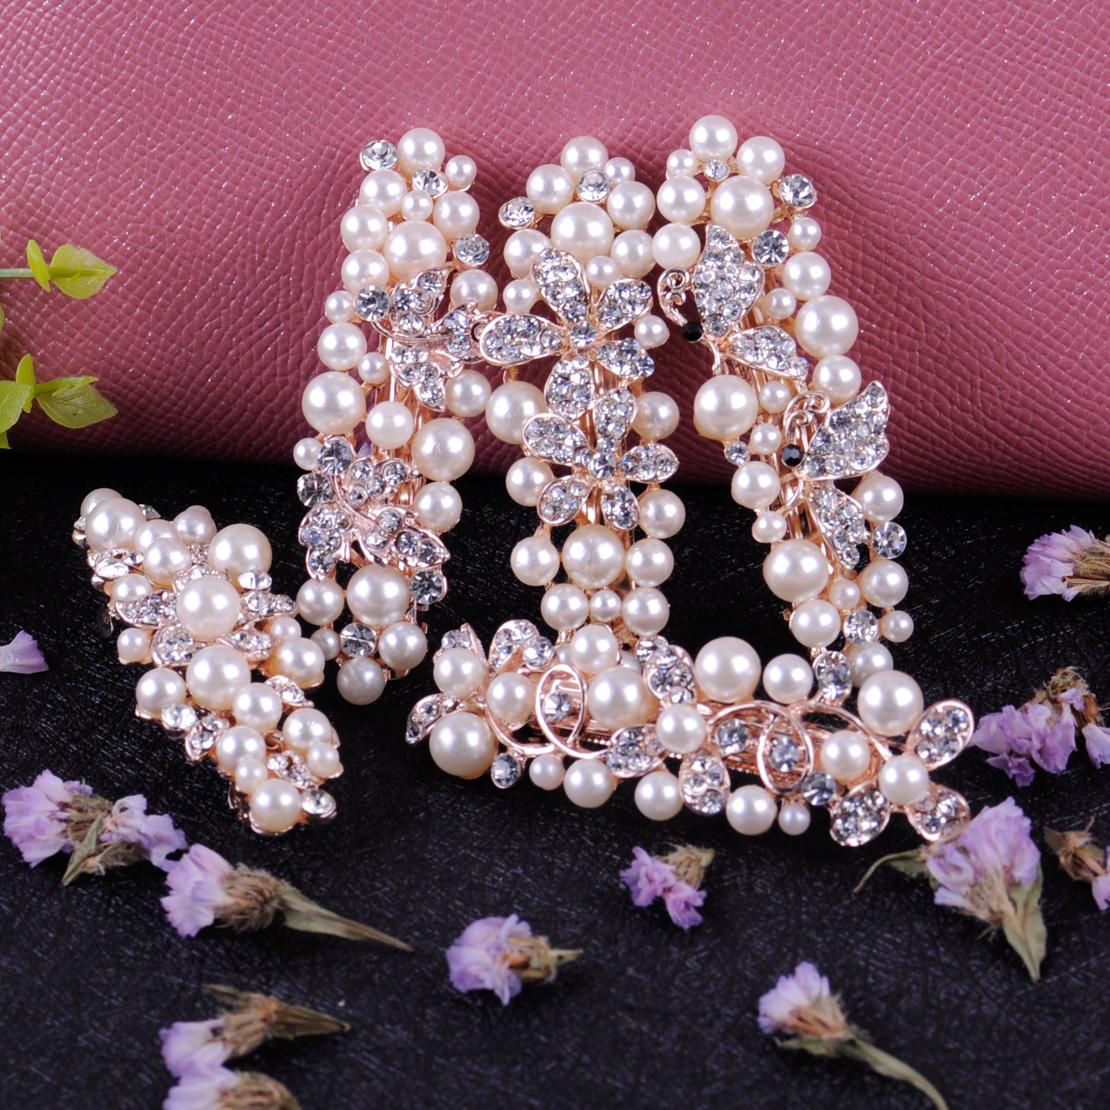 Damen Kristall Strass Haarnadel Blume Haarspange Haarklammer Haarschmuck Gifts